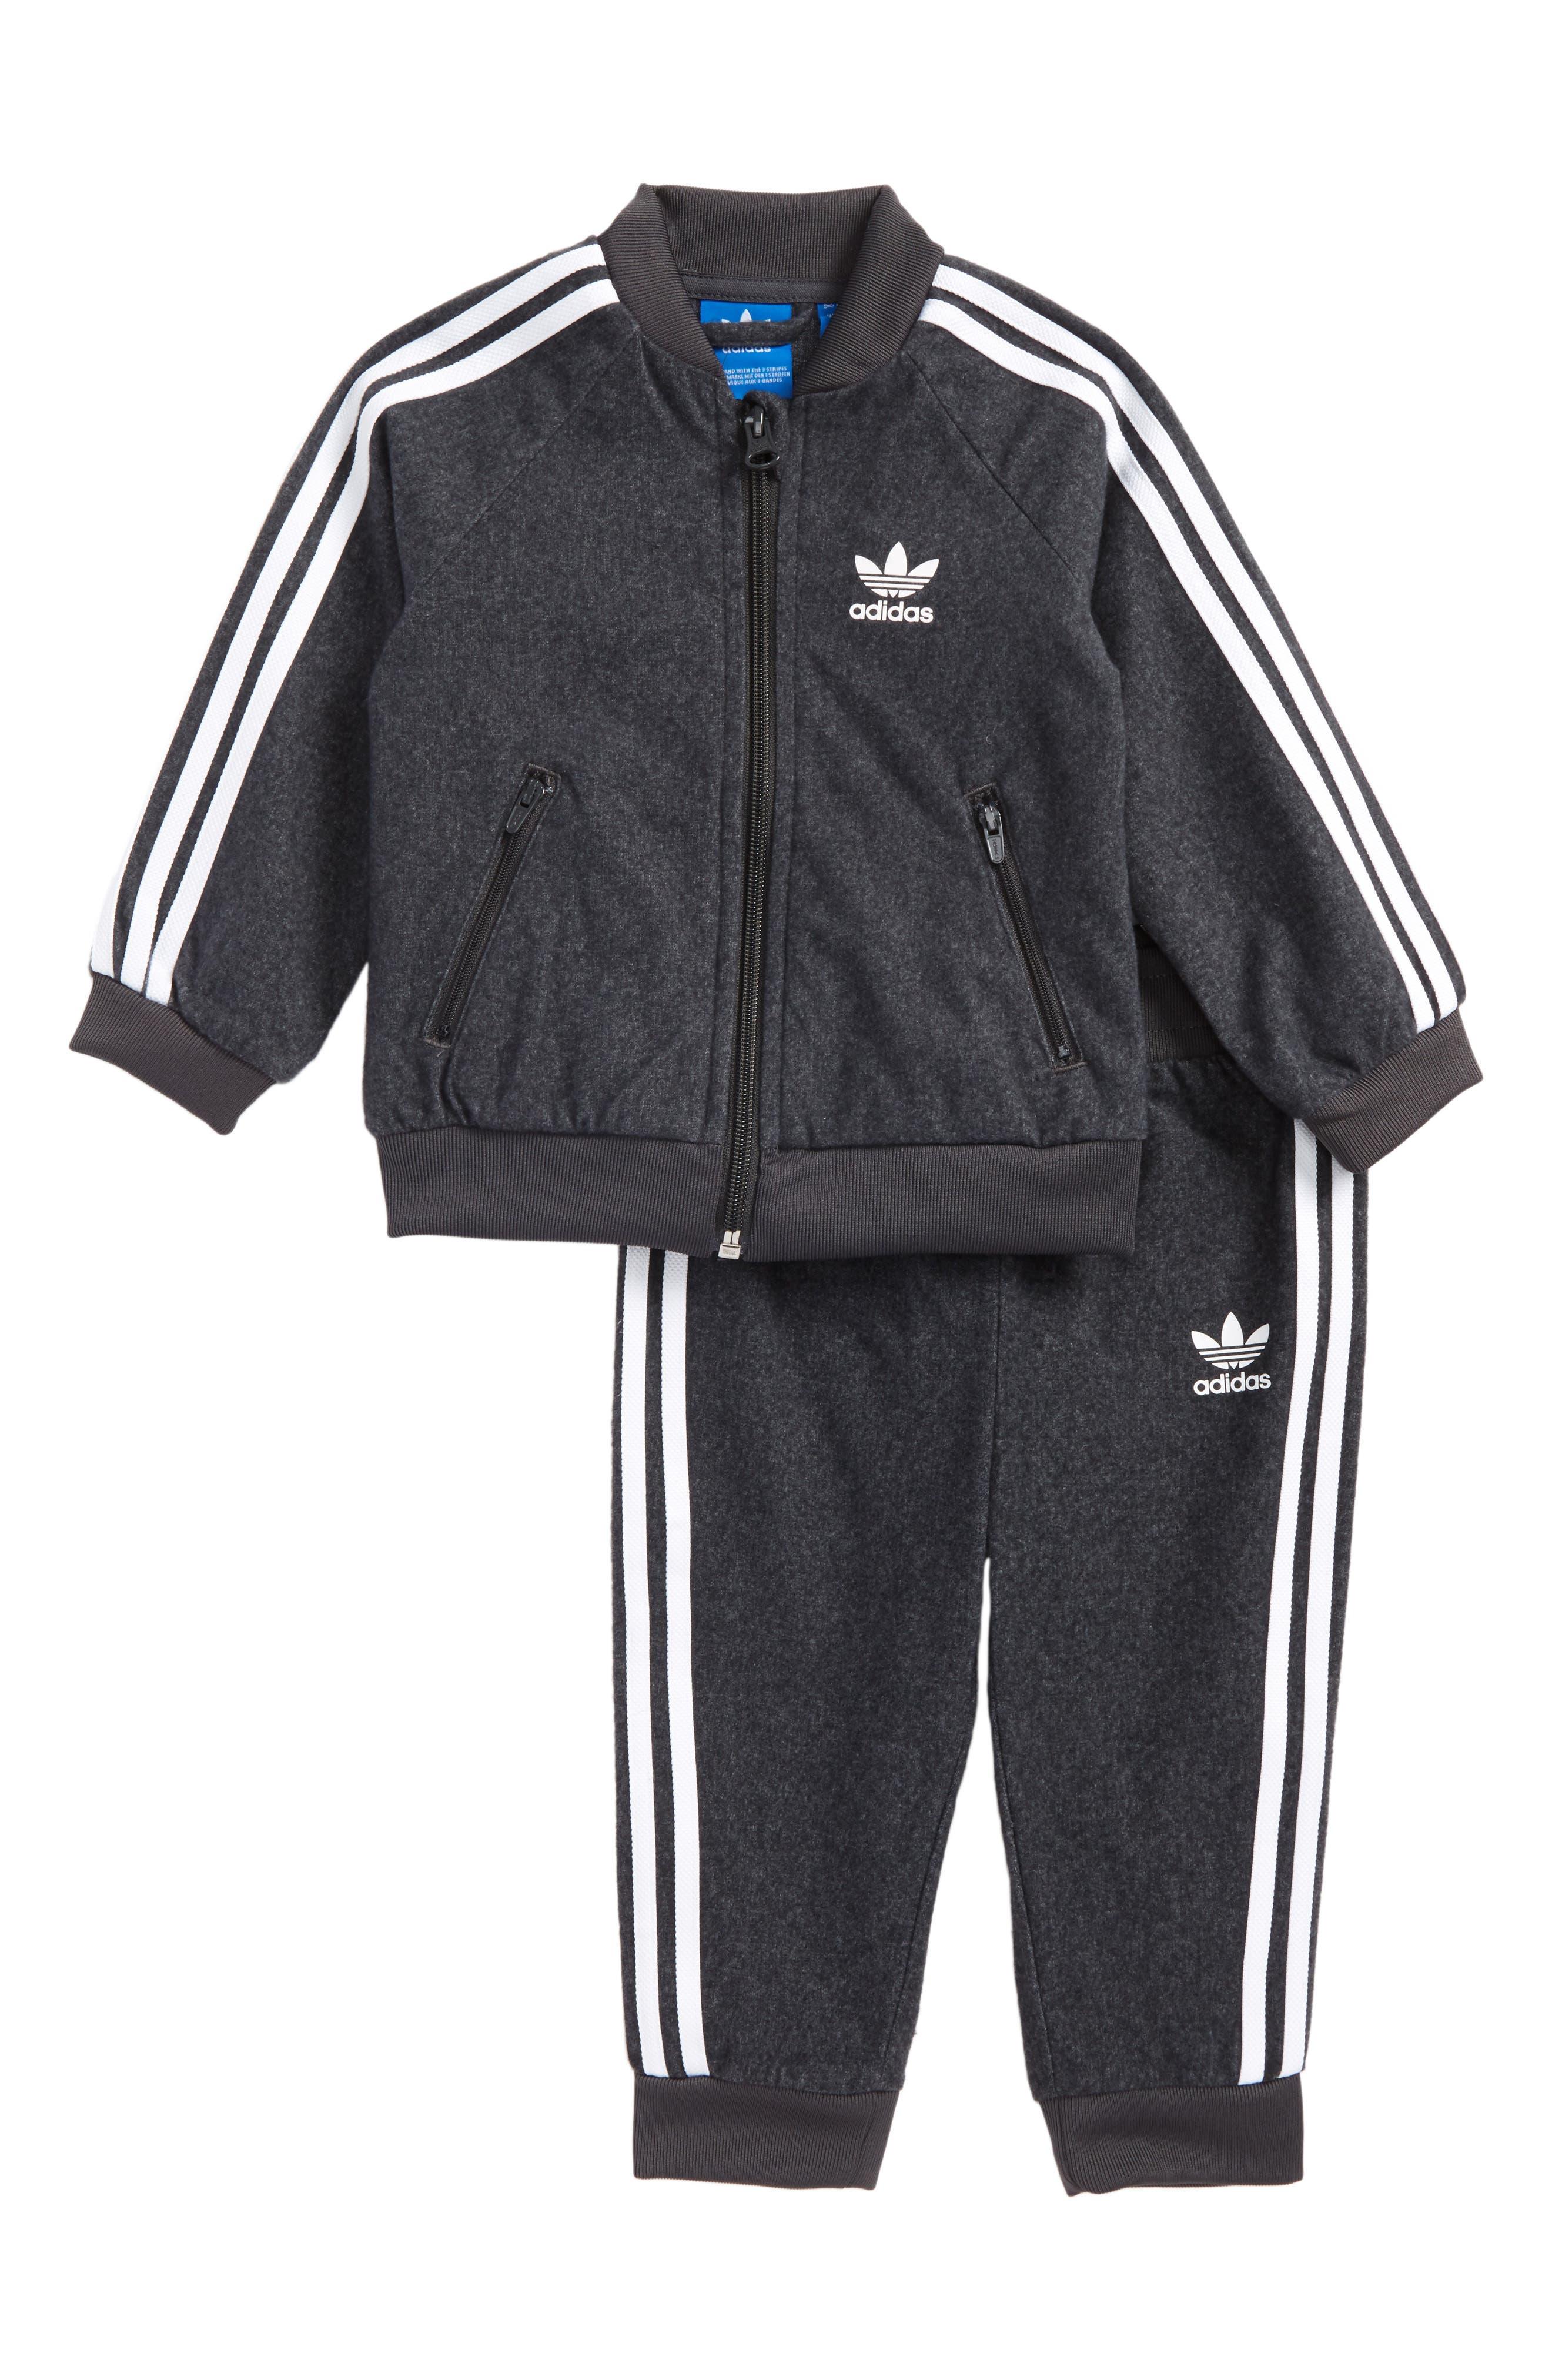 Alternate Image 1 Selected - adidas Originals Superstar Twill Track Jacket & Pants Set (Baby Boys)